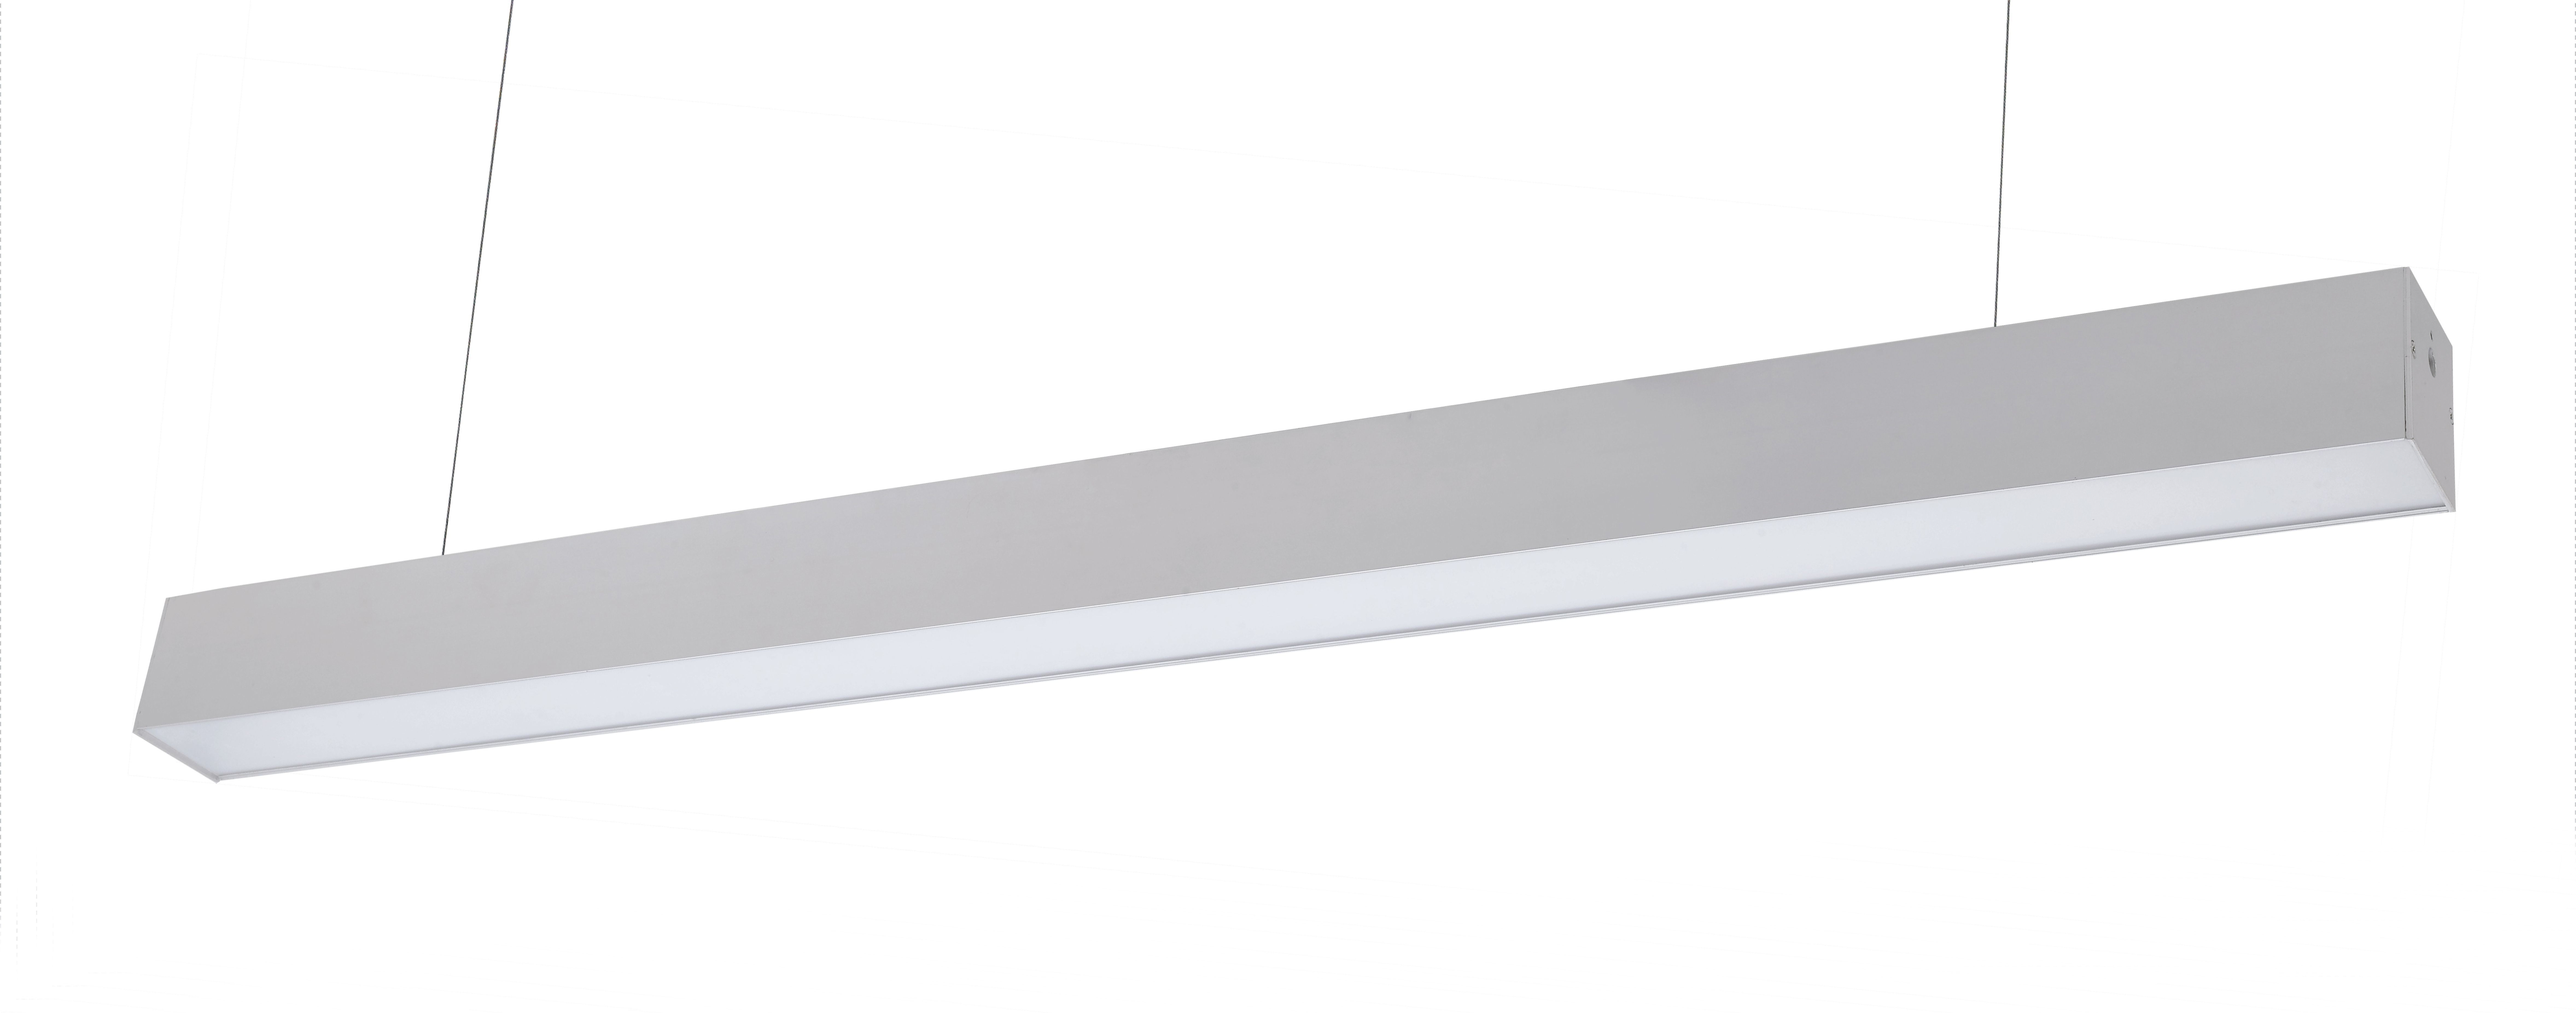 4 Foot Led Direct Indirect Suspended Linear Fixture 40 Watt Linear Lighting Perimeter Lighting Fixtures